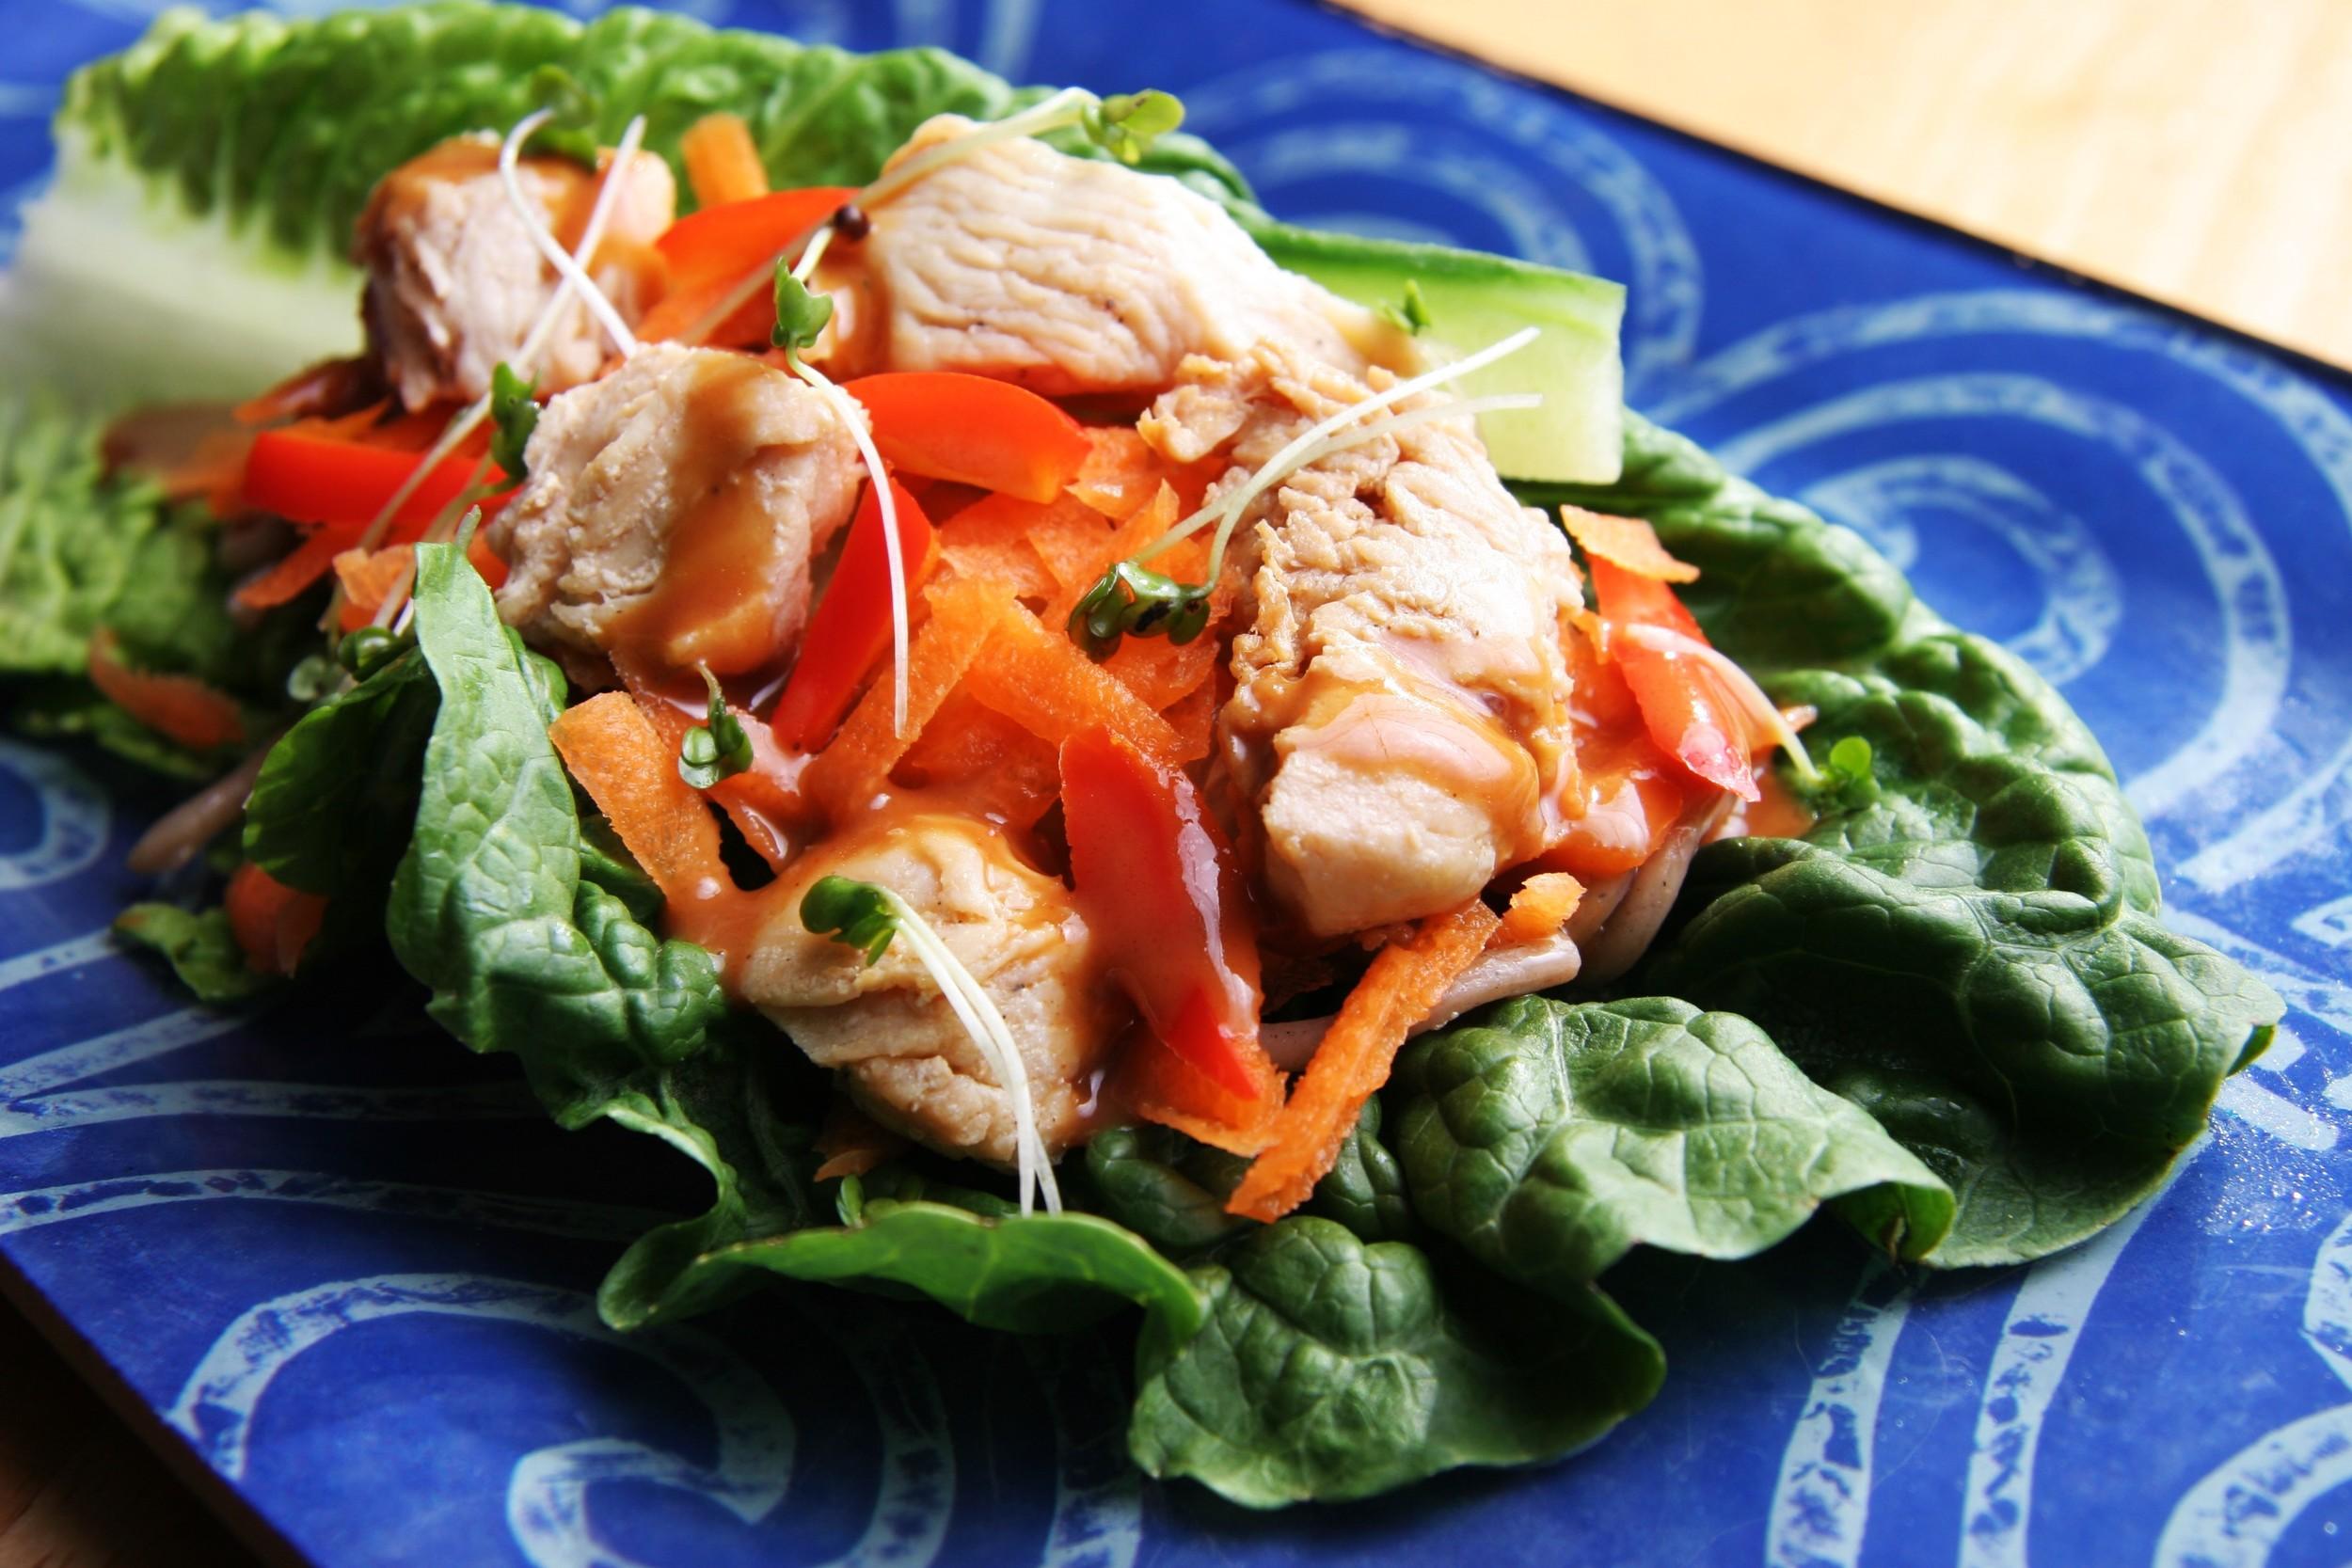 Chicken Lettuce Wrap  (photograph by Deborah Guzman-Meyer)